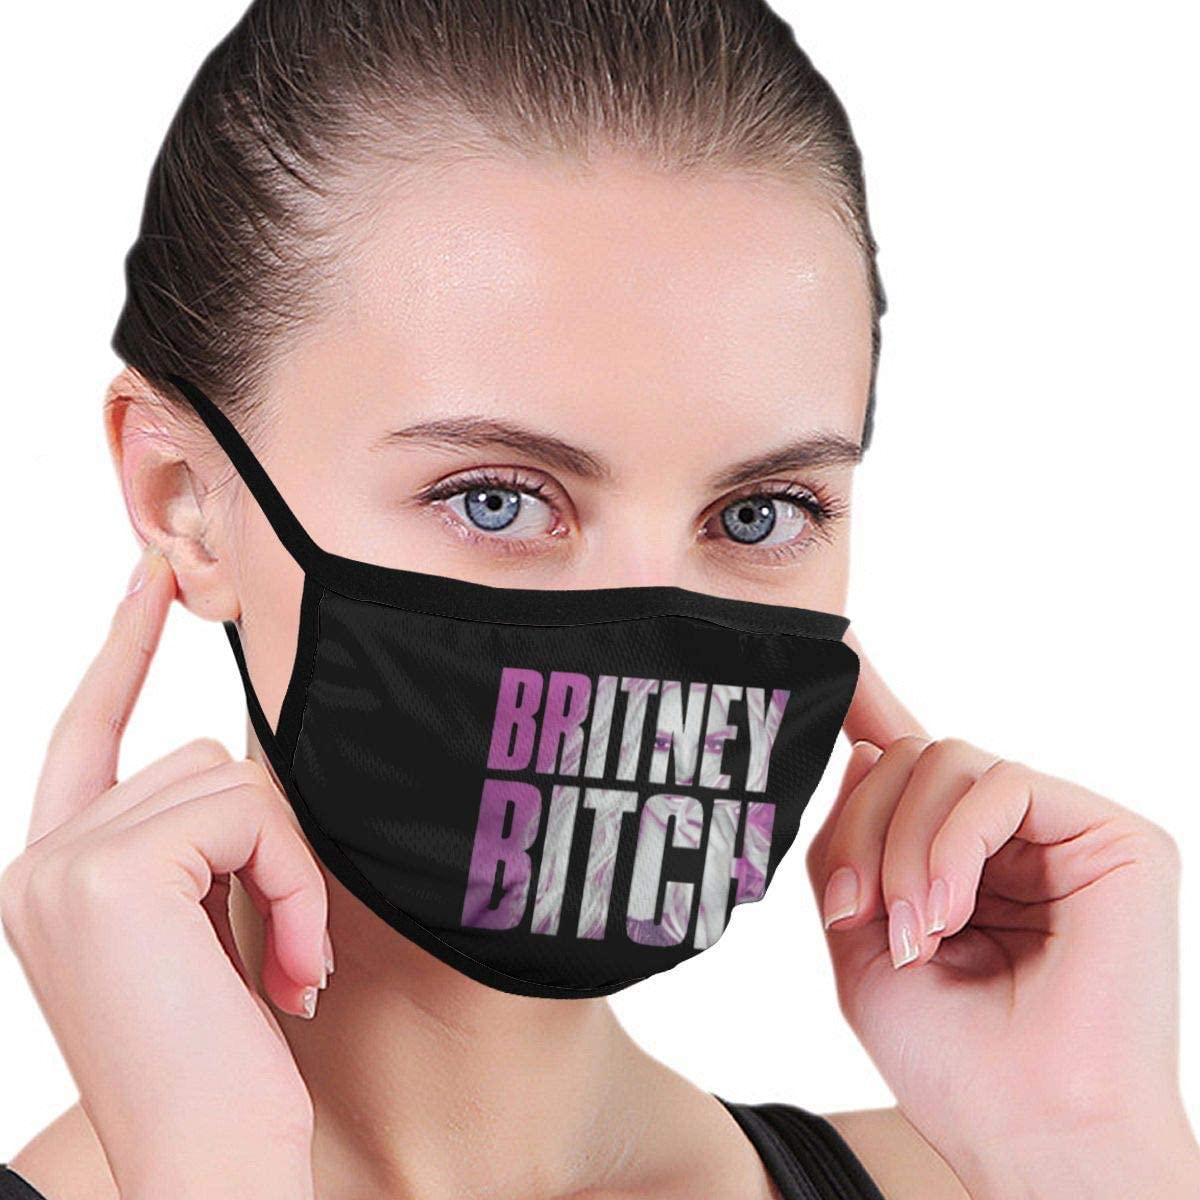 Nsafinhwv Britney Spears Britney Bitch Face Breathable Comfy Mouth Unisex Half Face Comfortable Reusable for Men Women